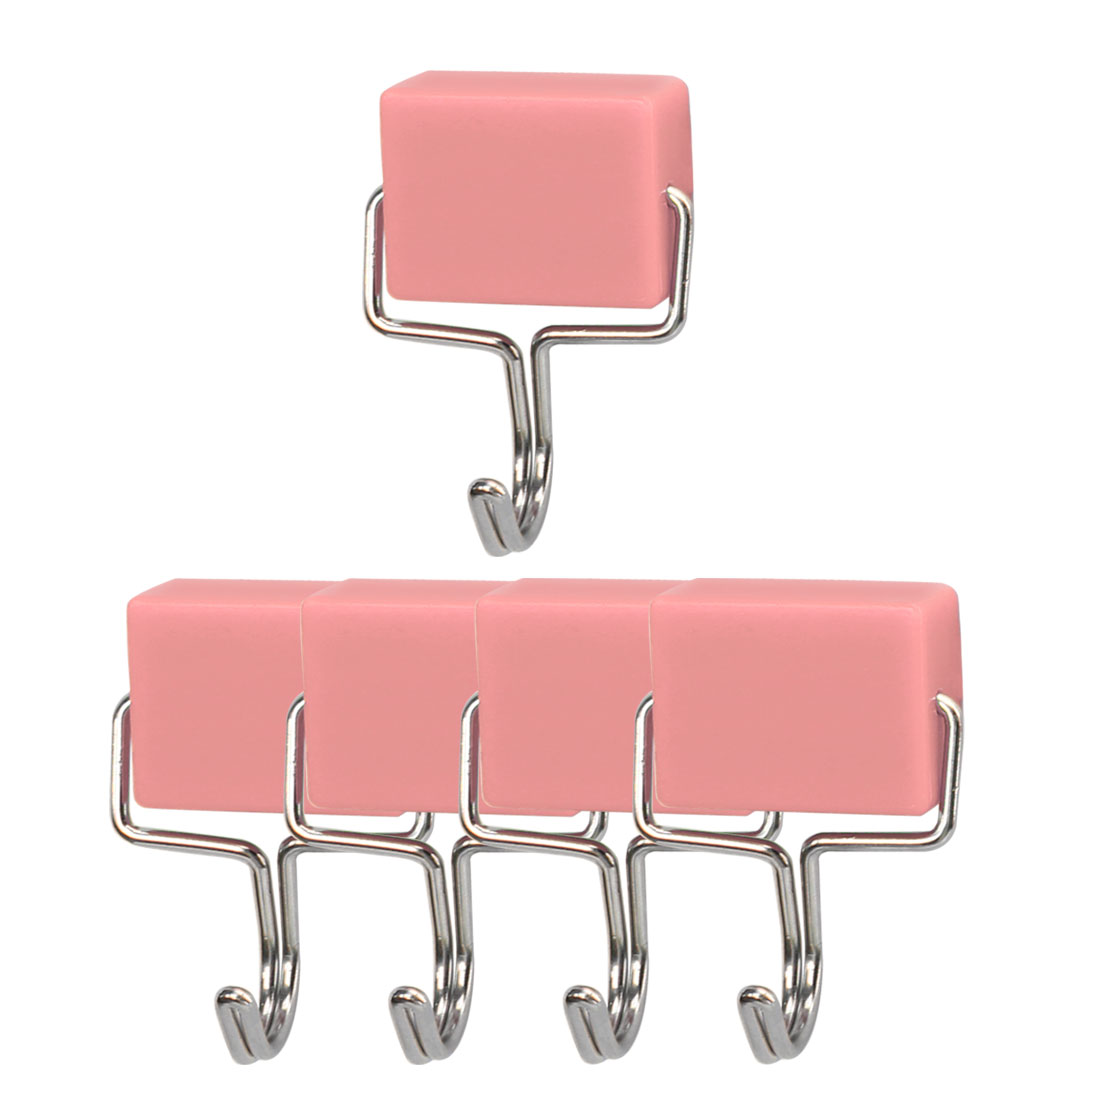 5pcs Magnetic Hook Stainless Steel Wall Hooks Hanger for Coat Hat Holder Pink